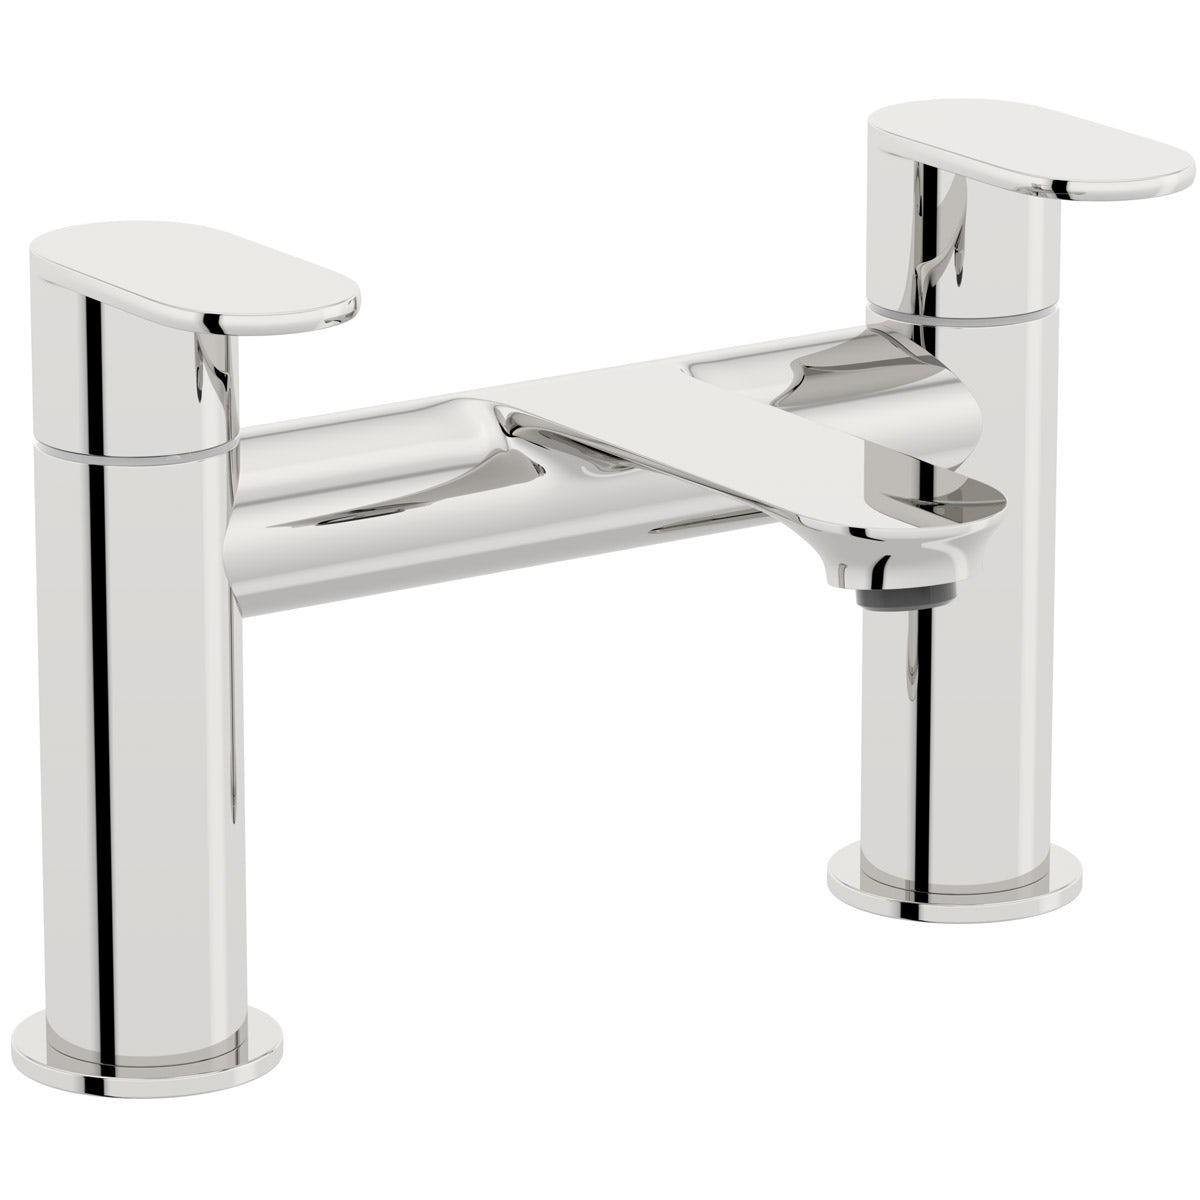 Orchard Wharfe bath mixer tap